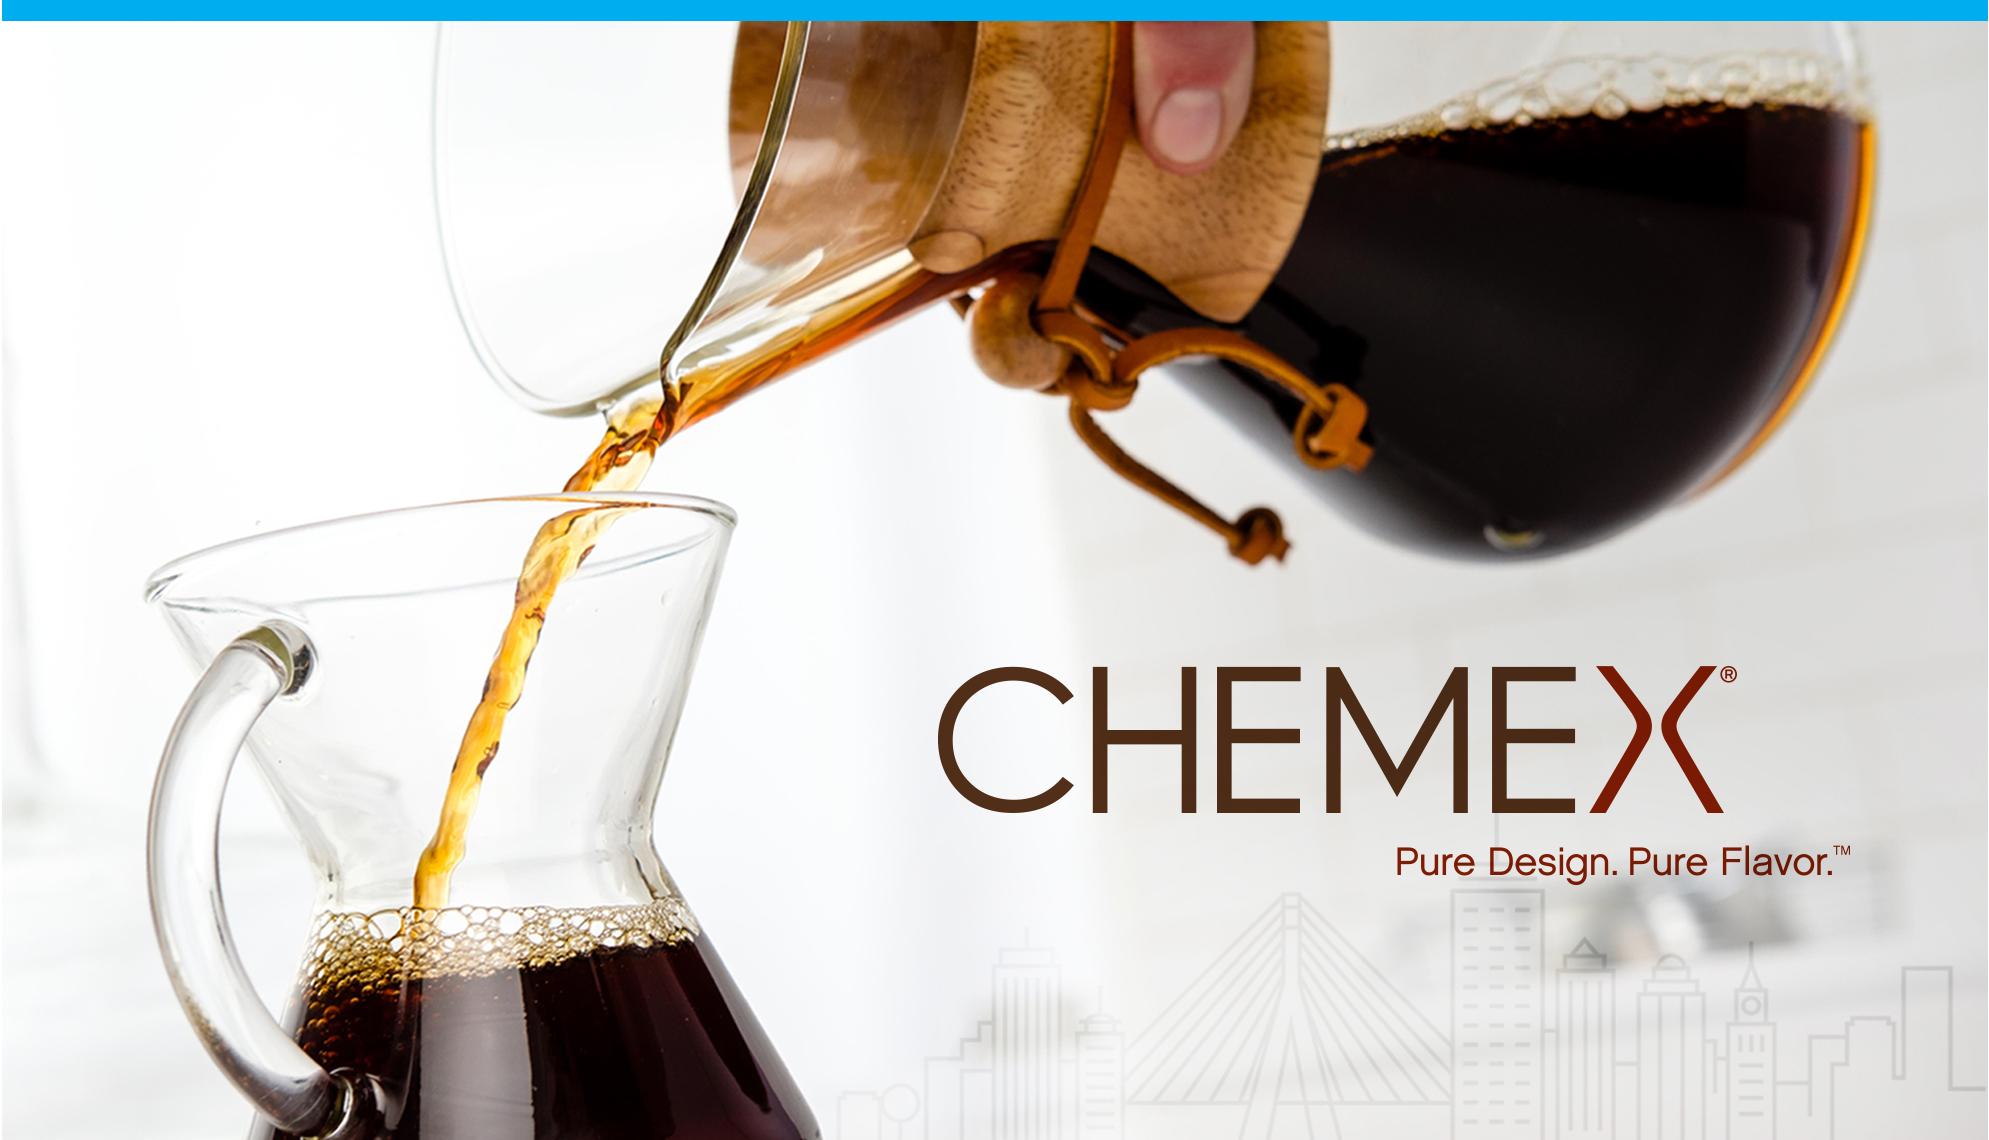 Chemex-header.jpg